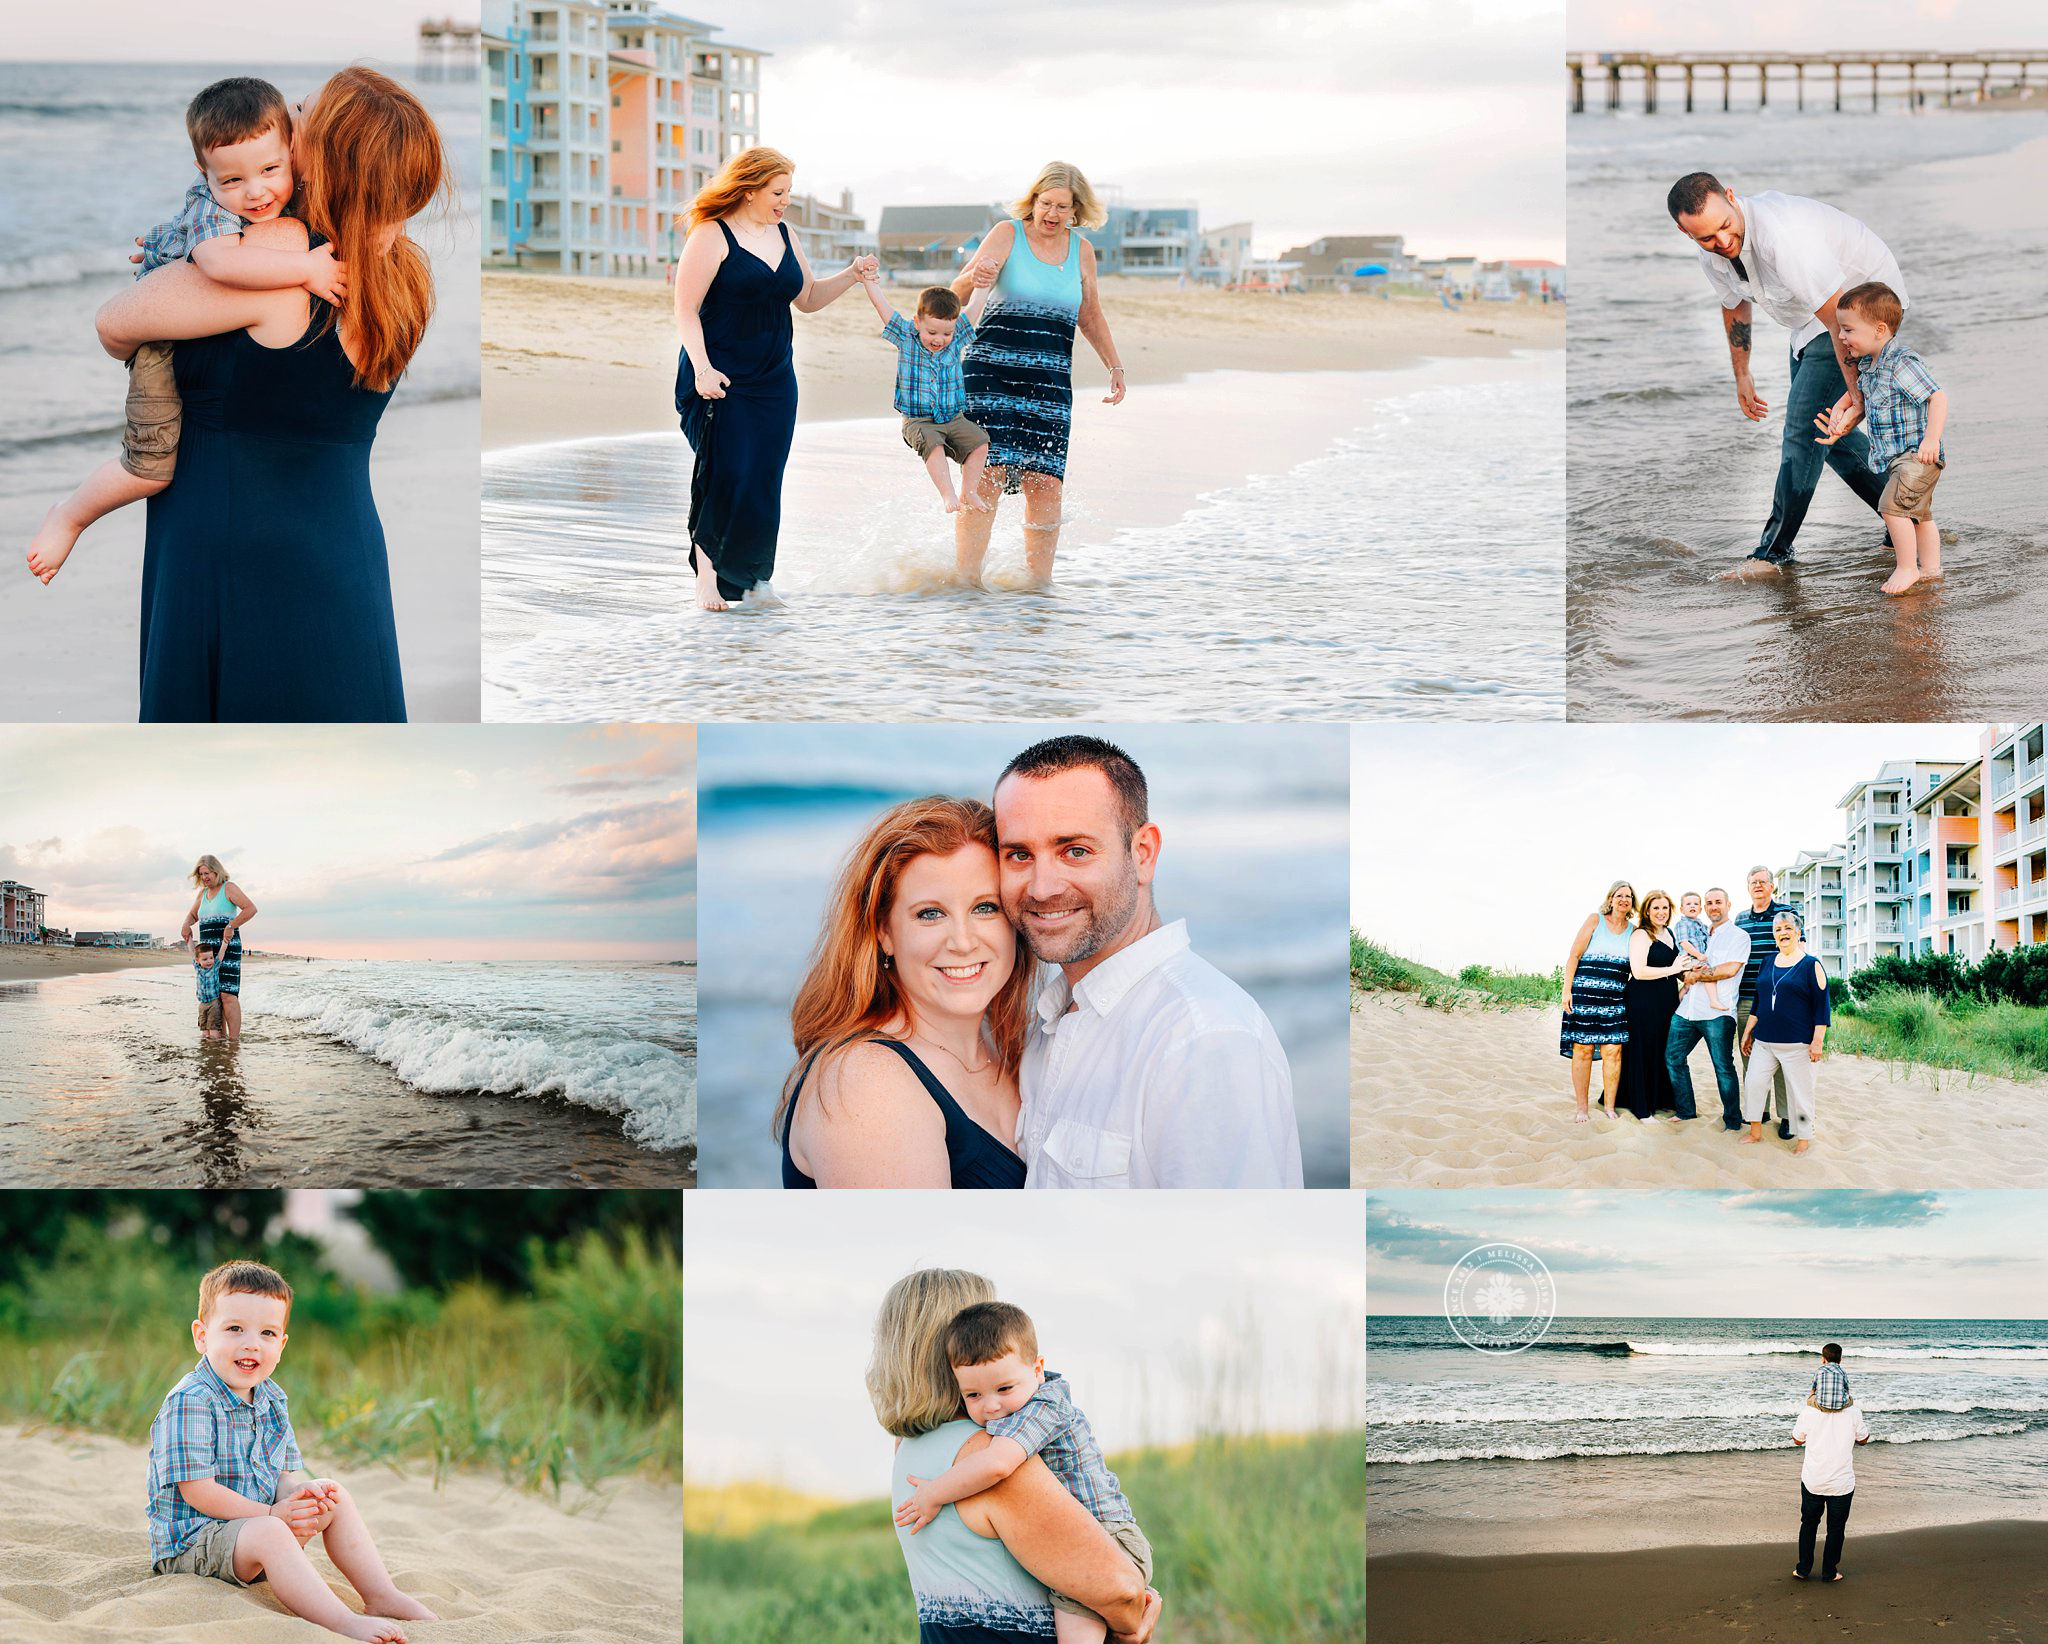 sandbridge-beach-photographers-virginia-beach-family-photographers-candid-natural-lifestyle-photography-melissa-bliss-photography.jpg